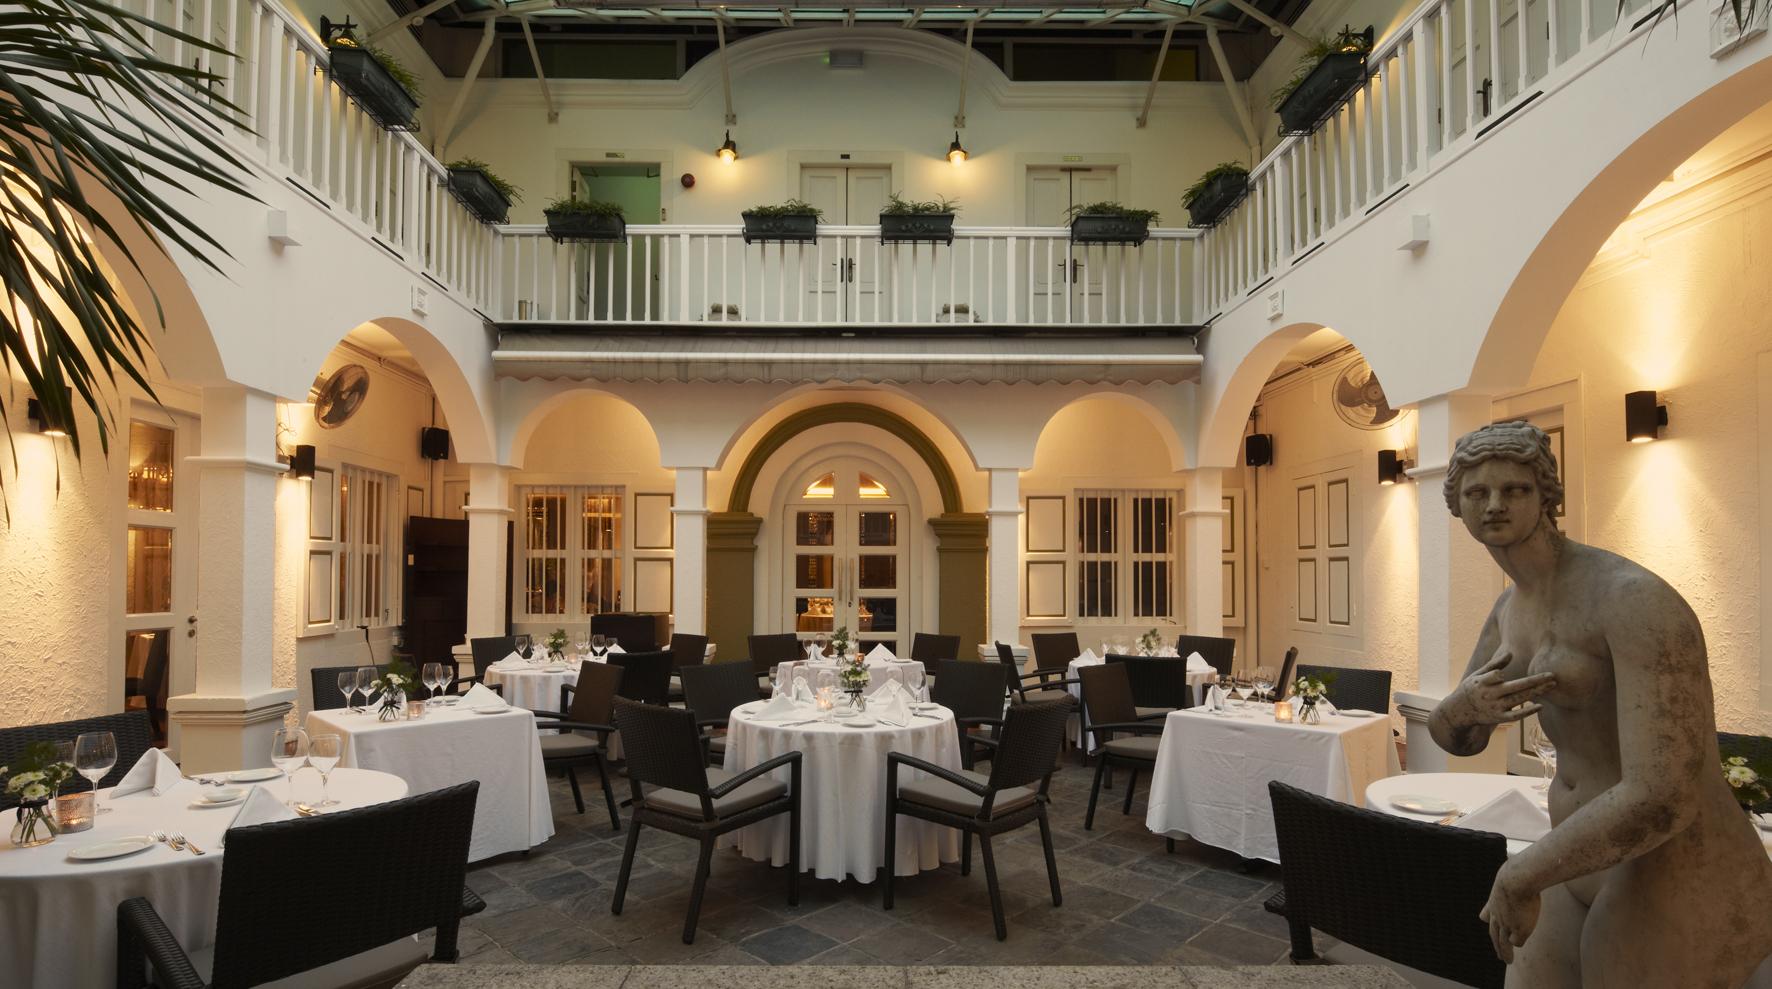 Unique-themed-parties-venuerific-blog-senso-ristorante-bar